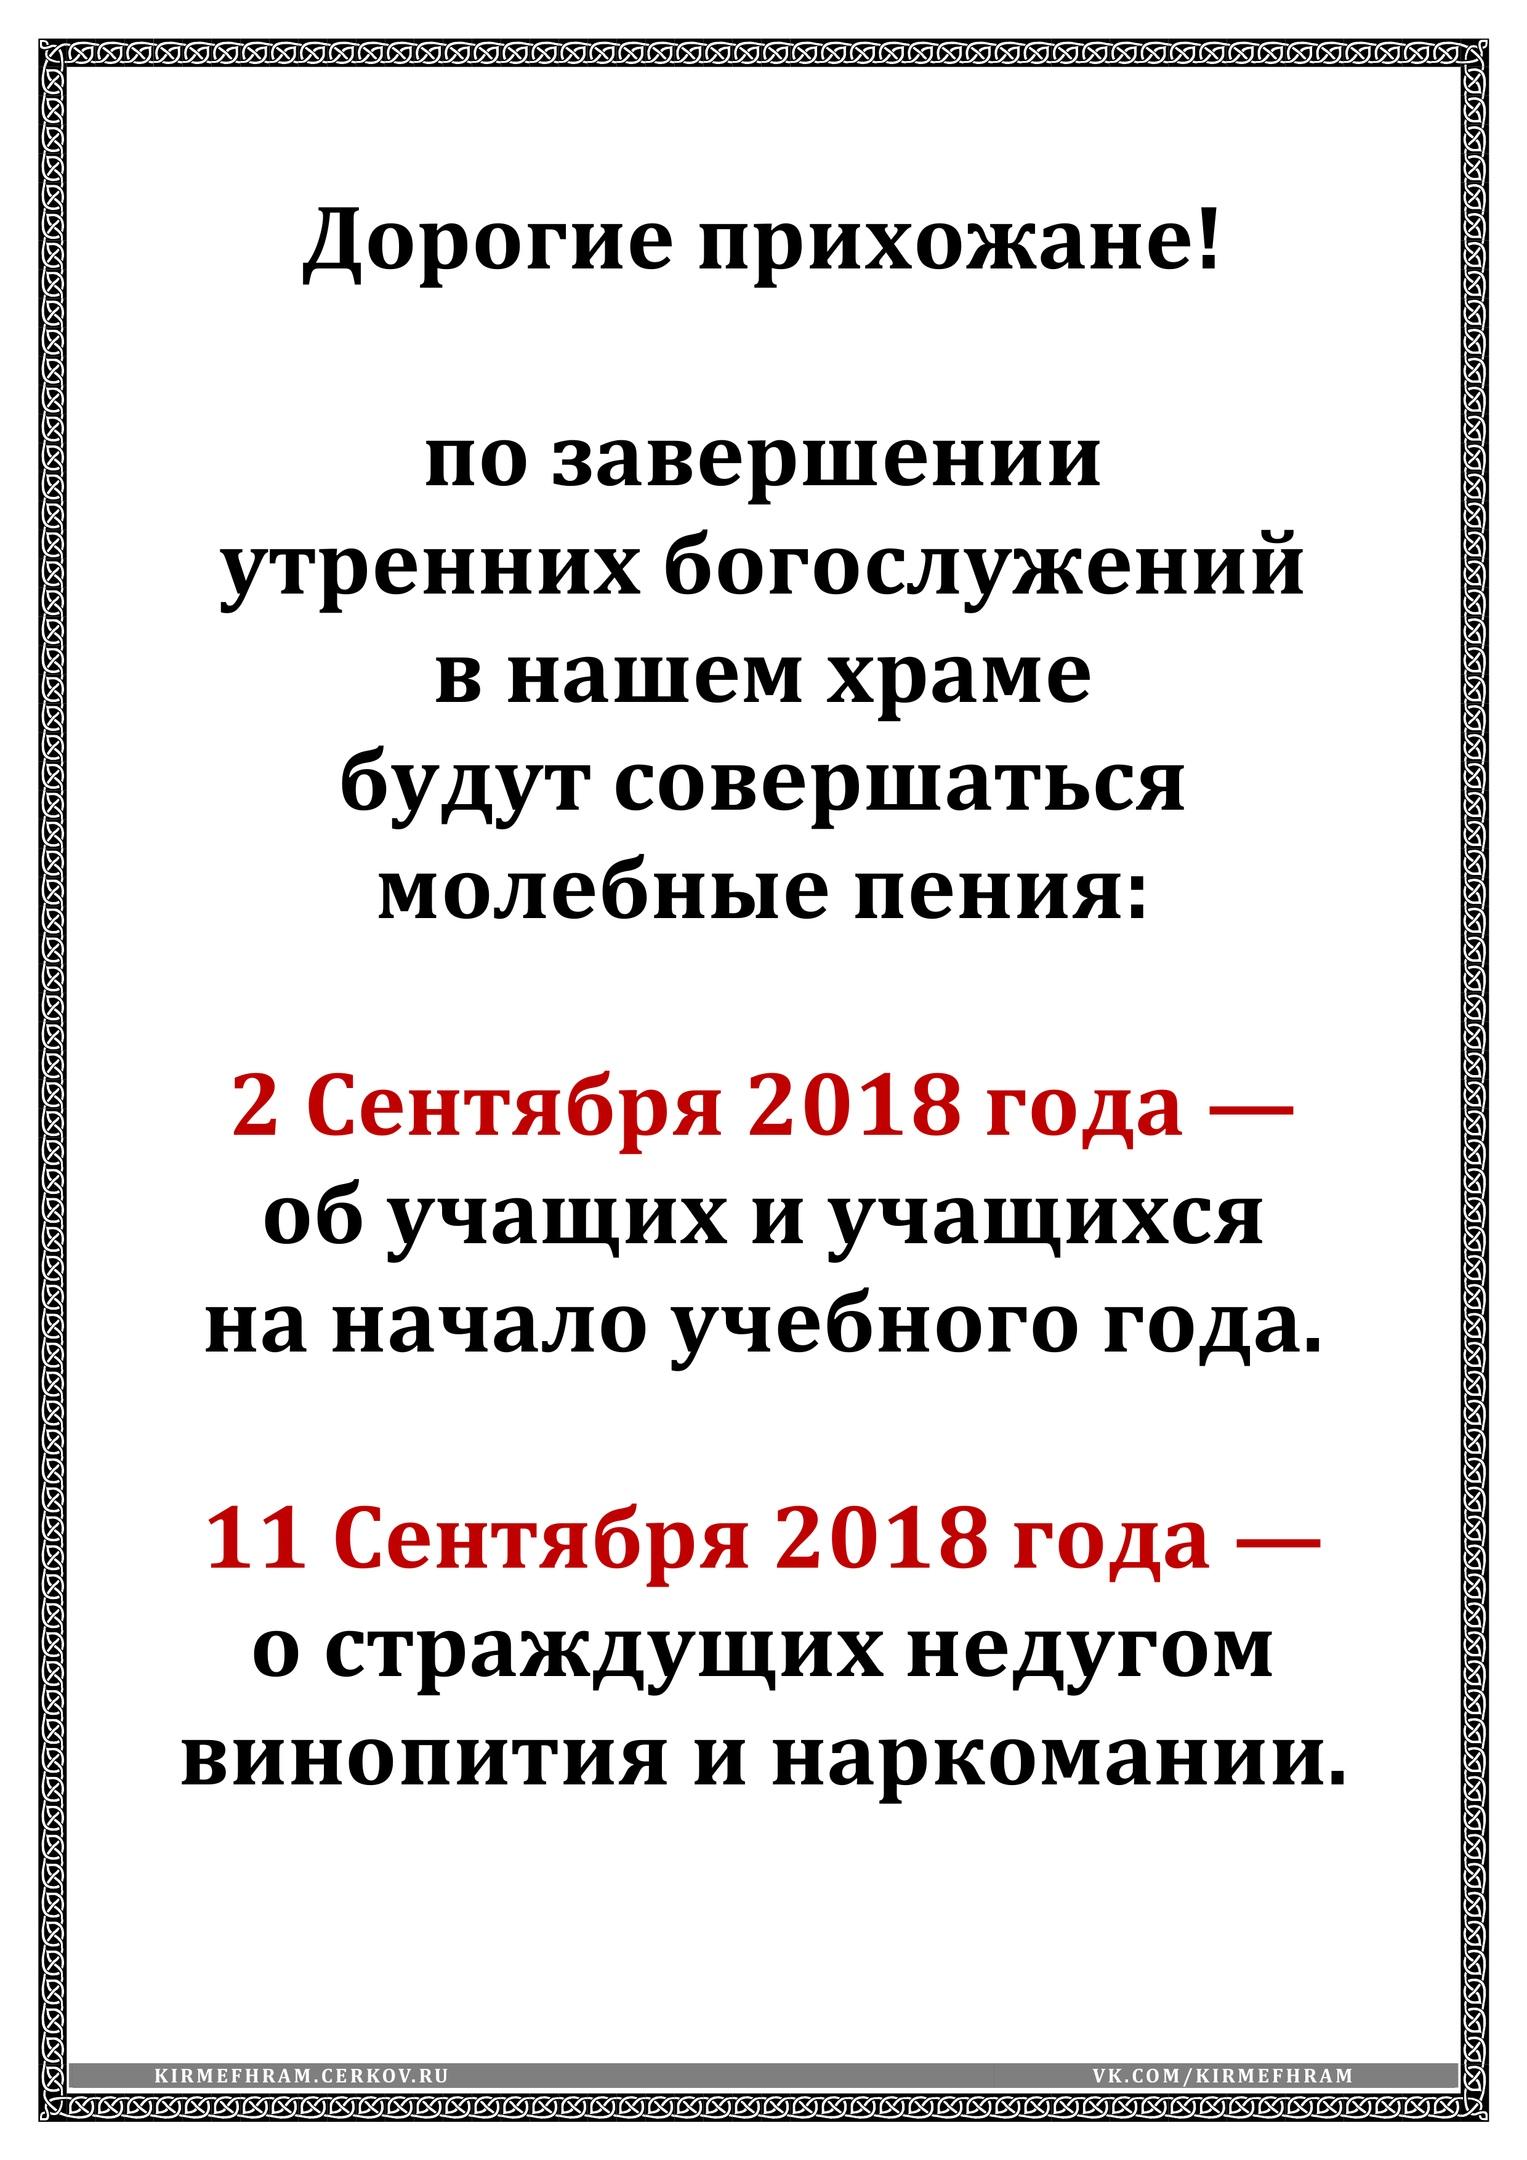 https://pp.userapi.com/c847219/v847219847/ce79b/qg7km9f2y7o.jpg